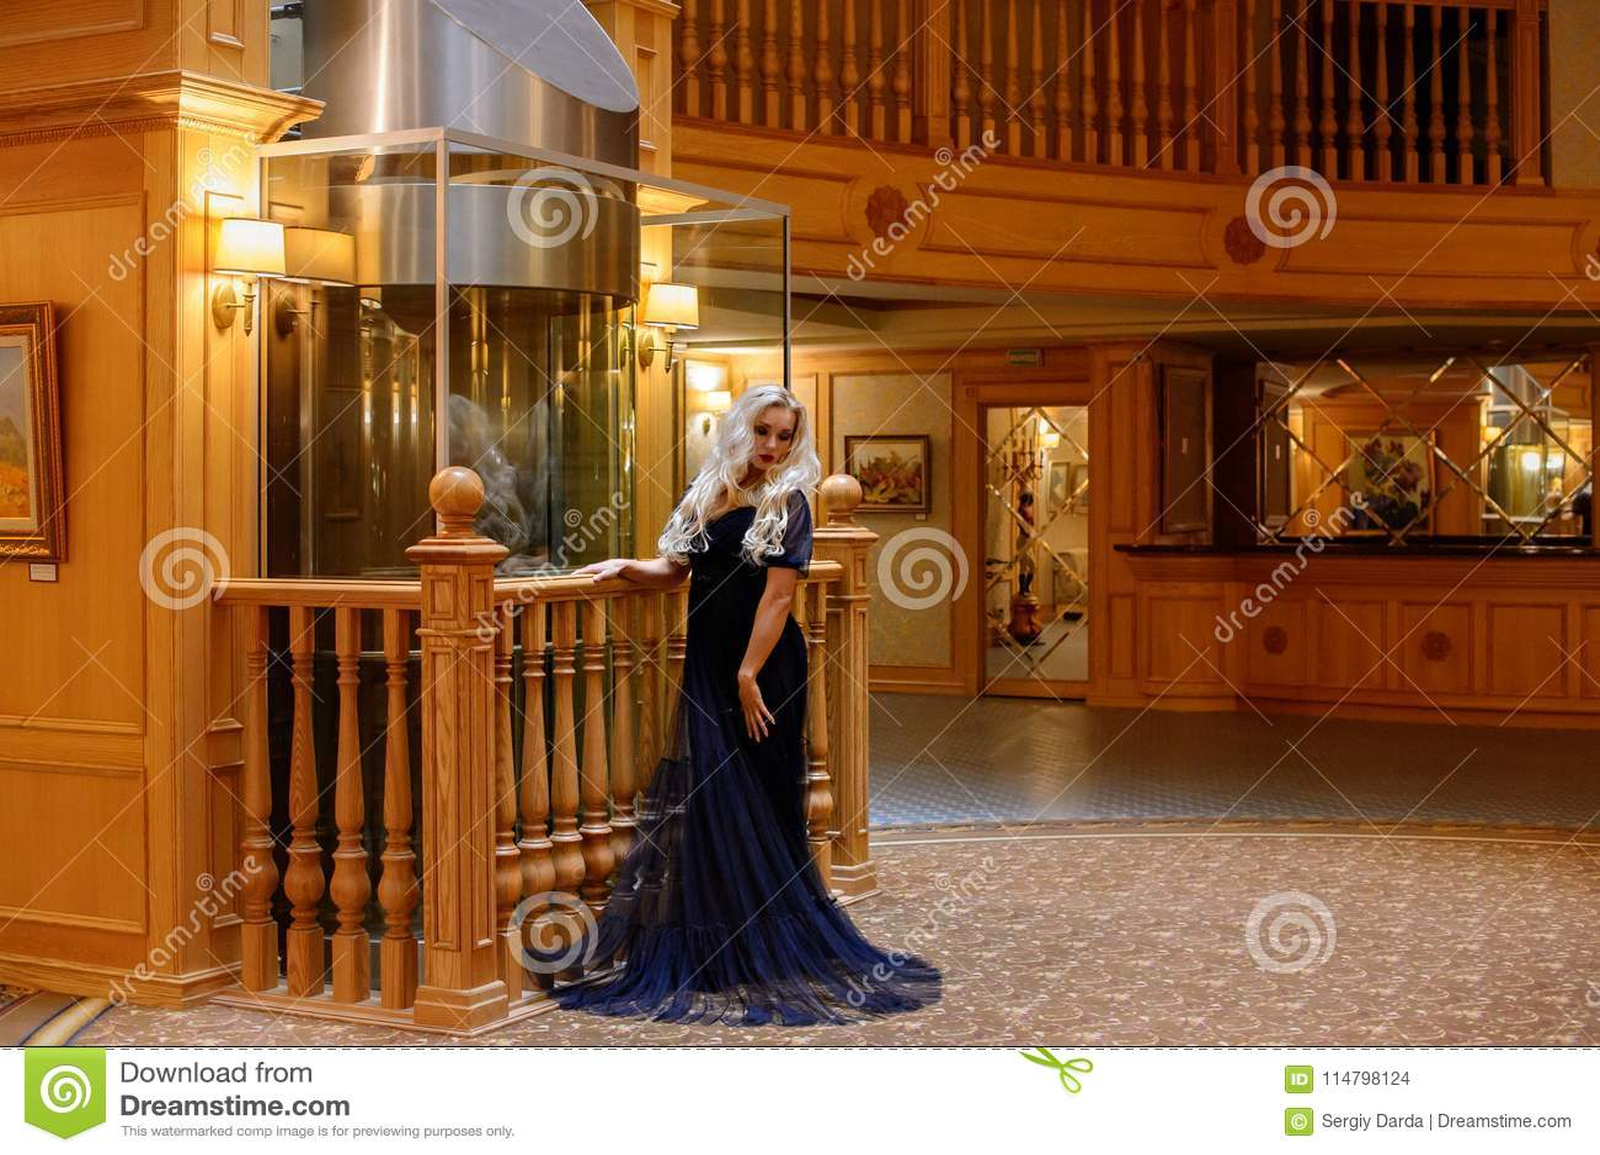 girl with long hair posing in hotel